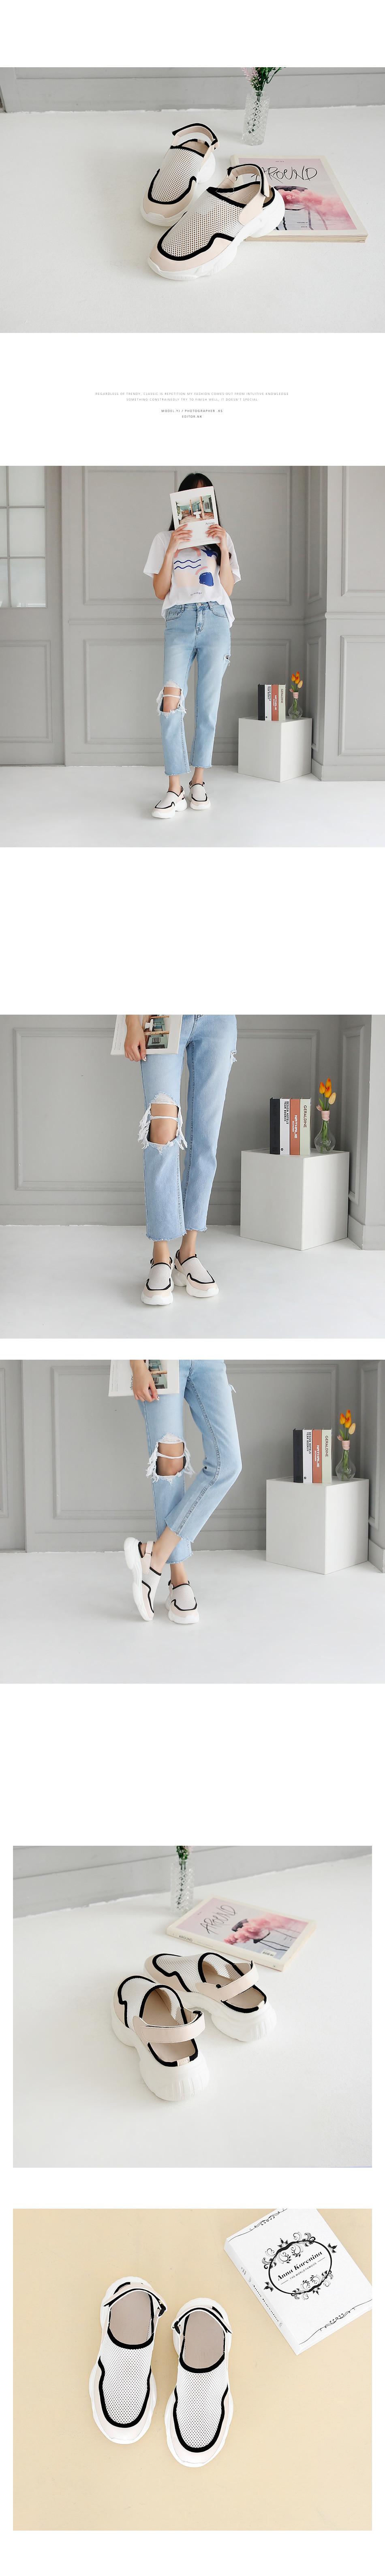 Tailon slip-on sandals 5cm